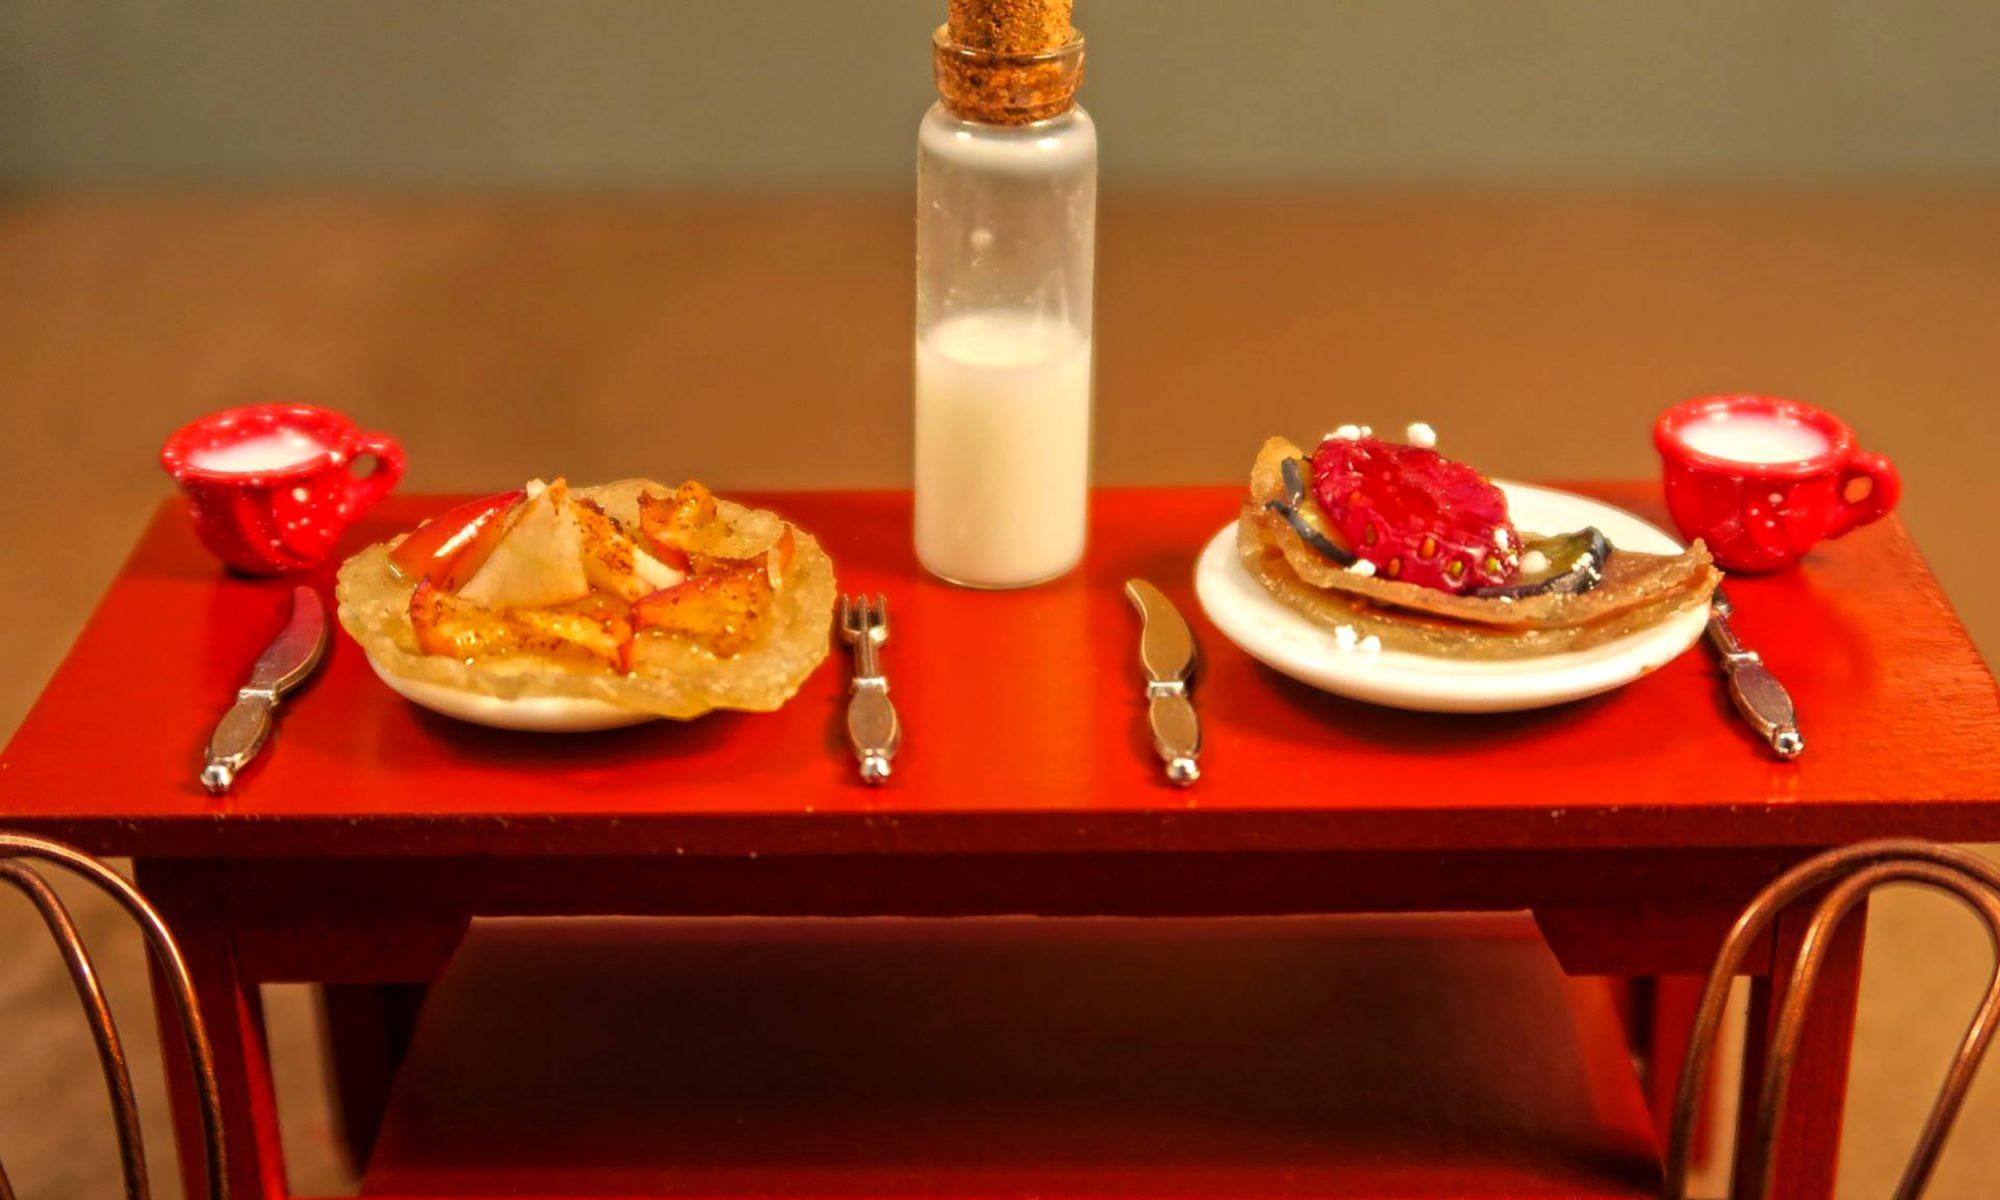 EC: The Cutest Mini Food Videos on the Internet